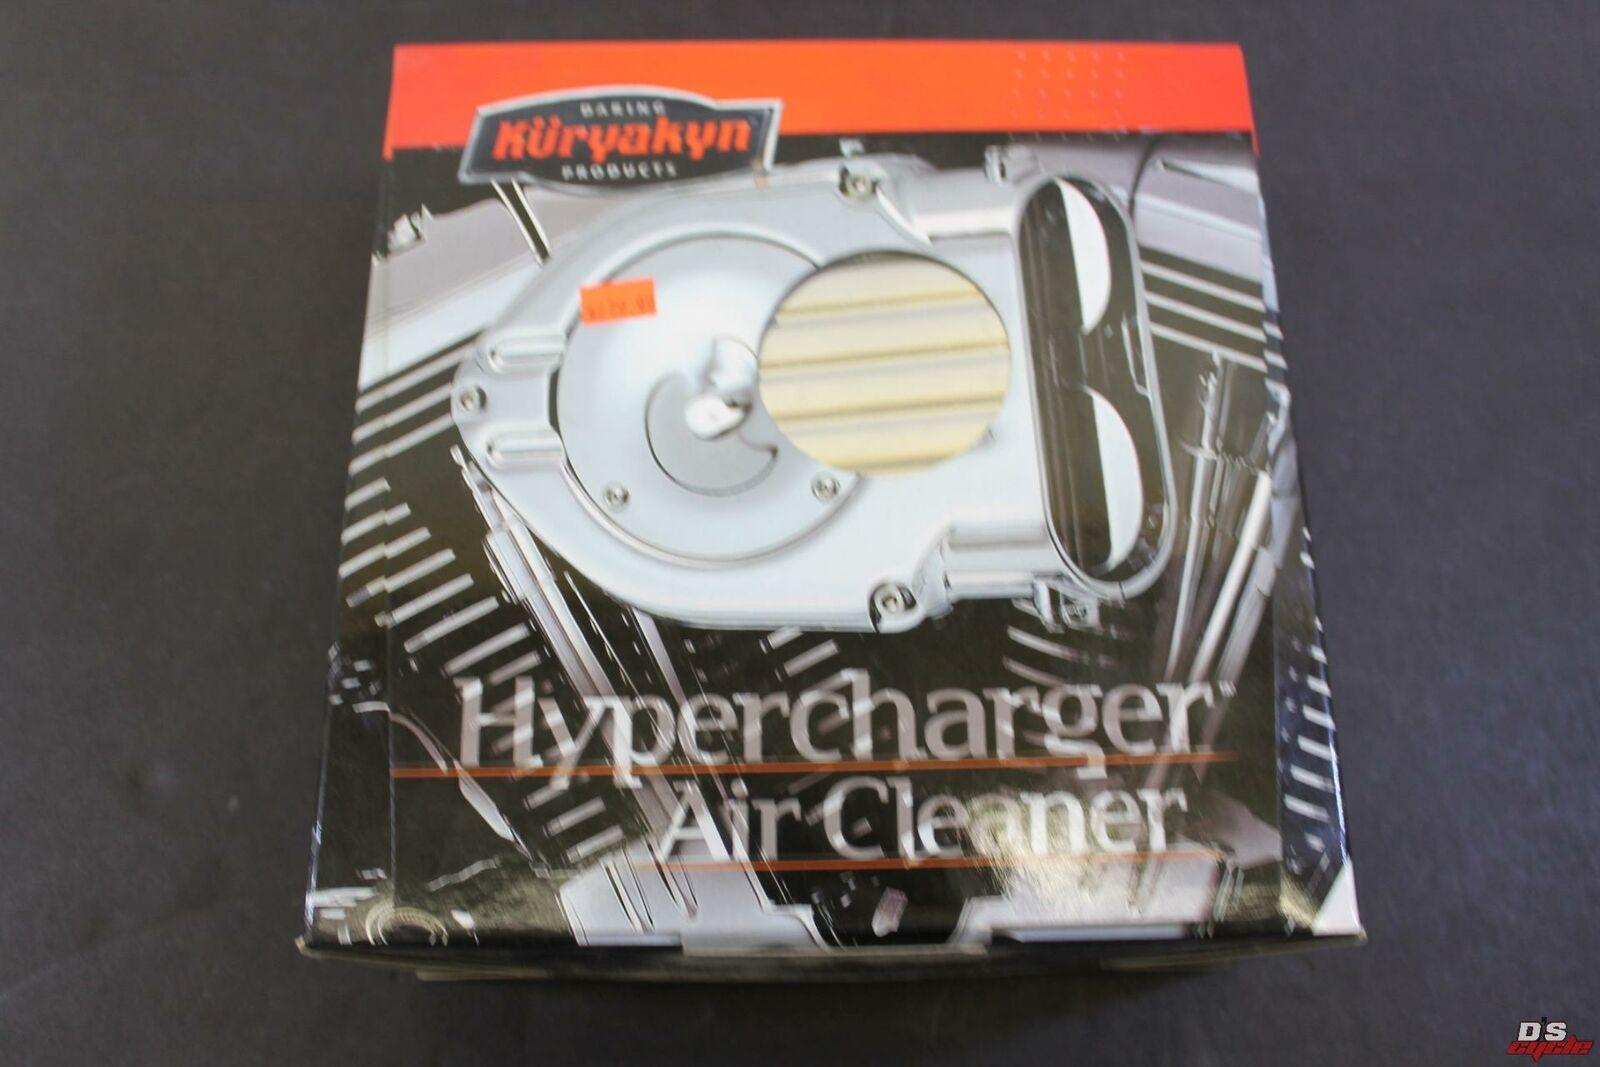 Kuryakyn 9300 Pro Series Chrome Hypercharger